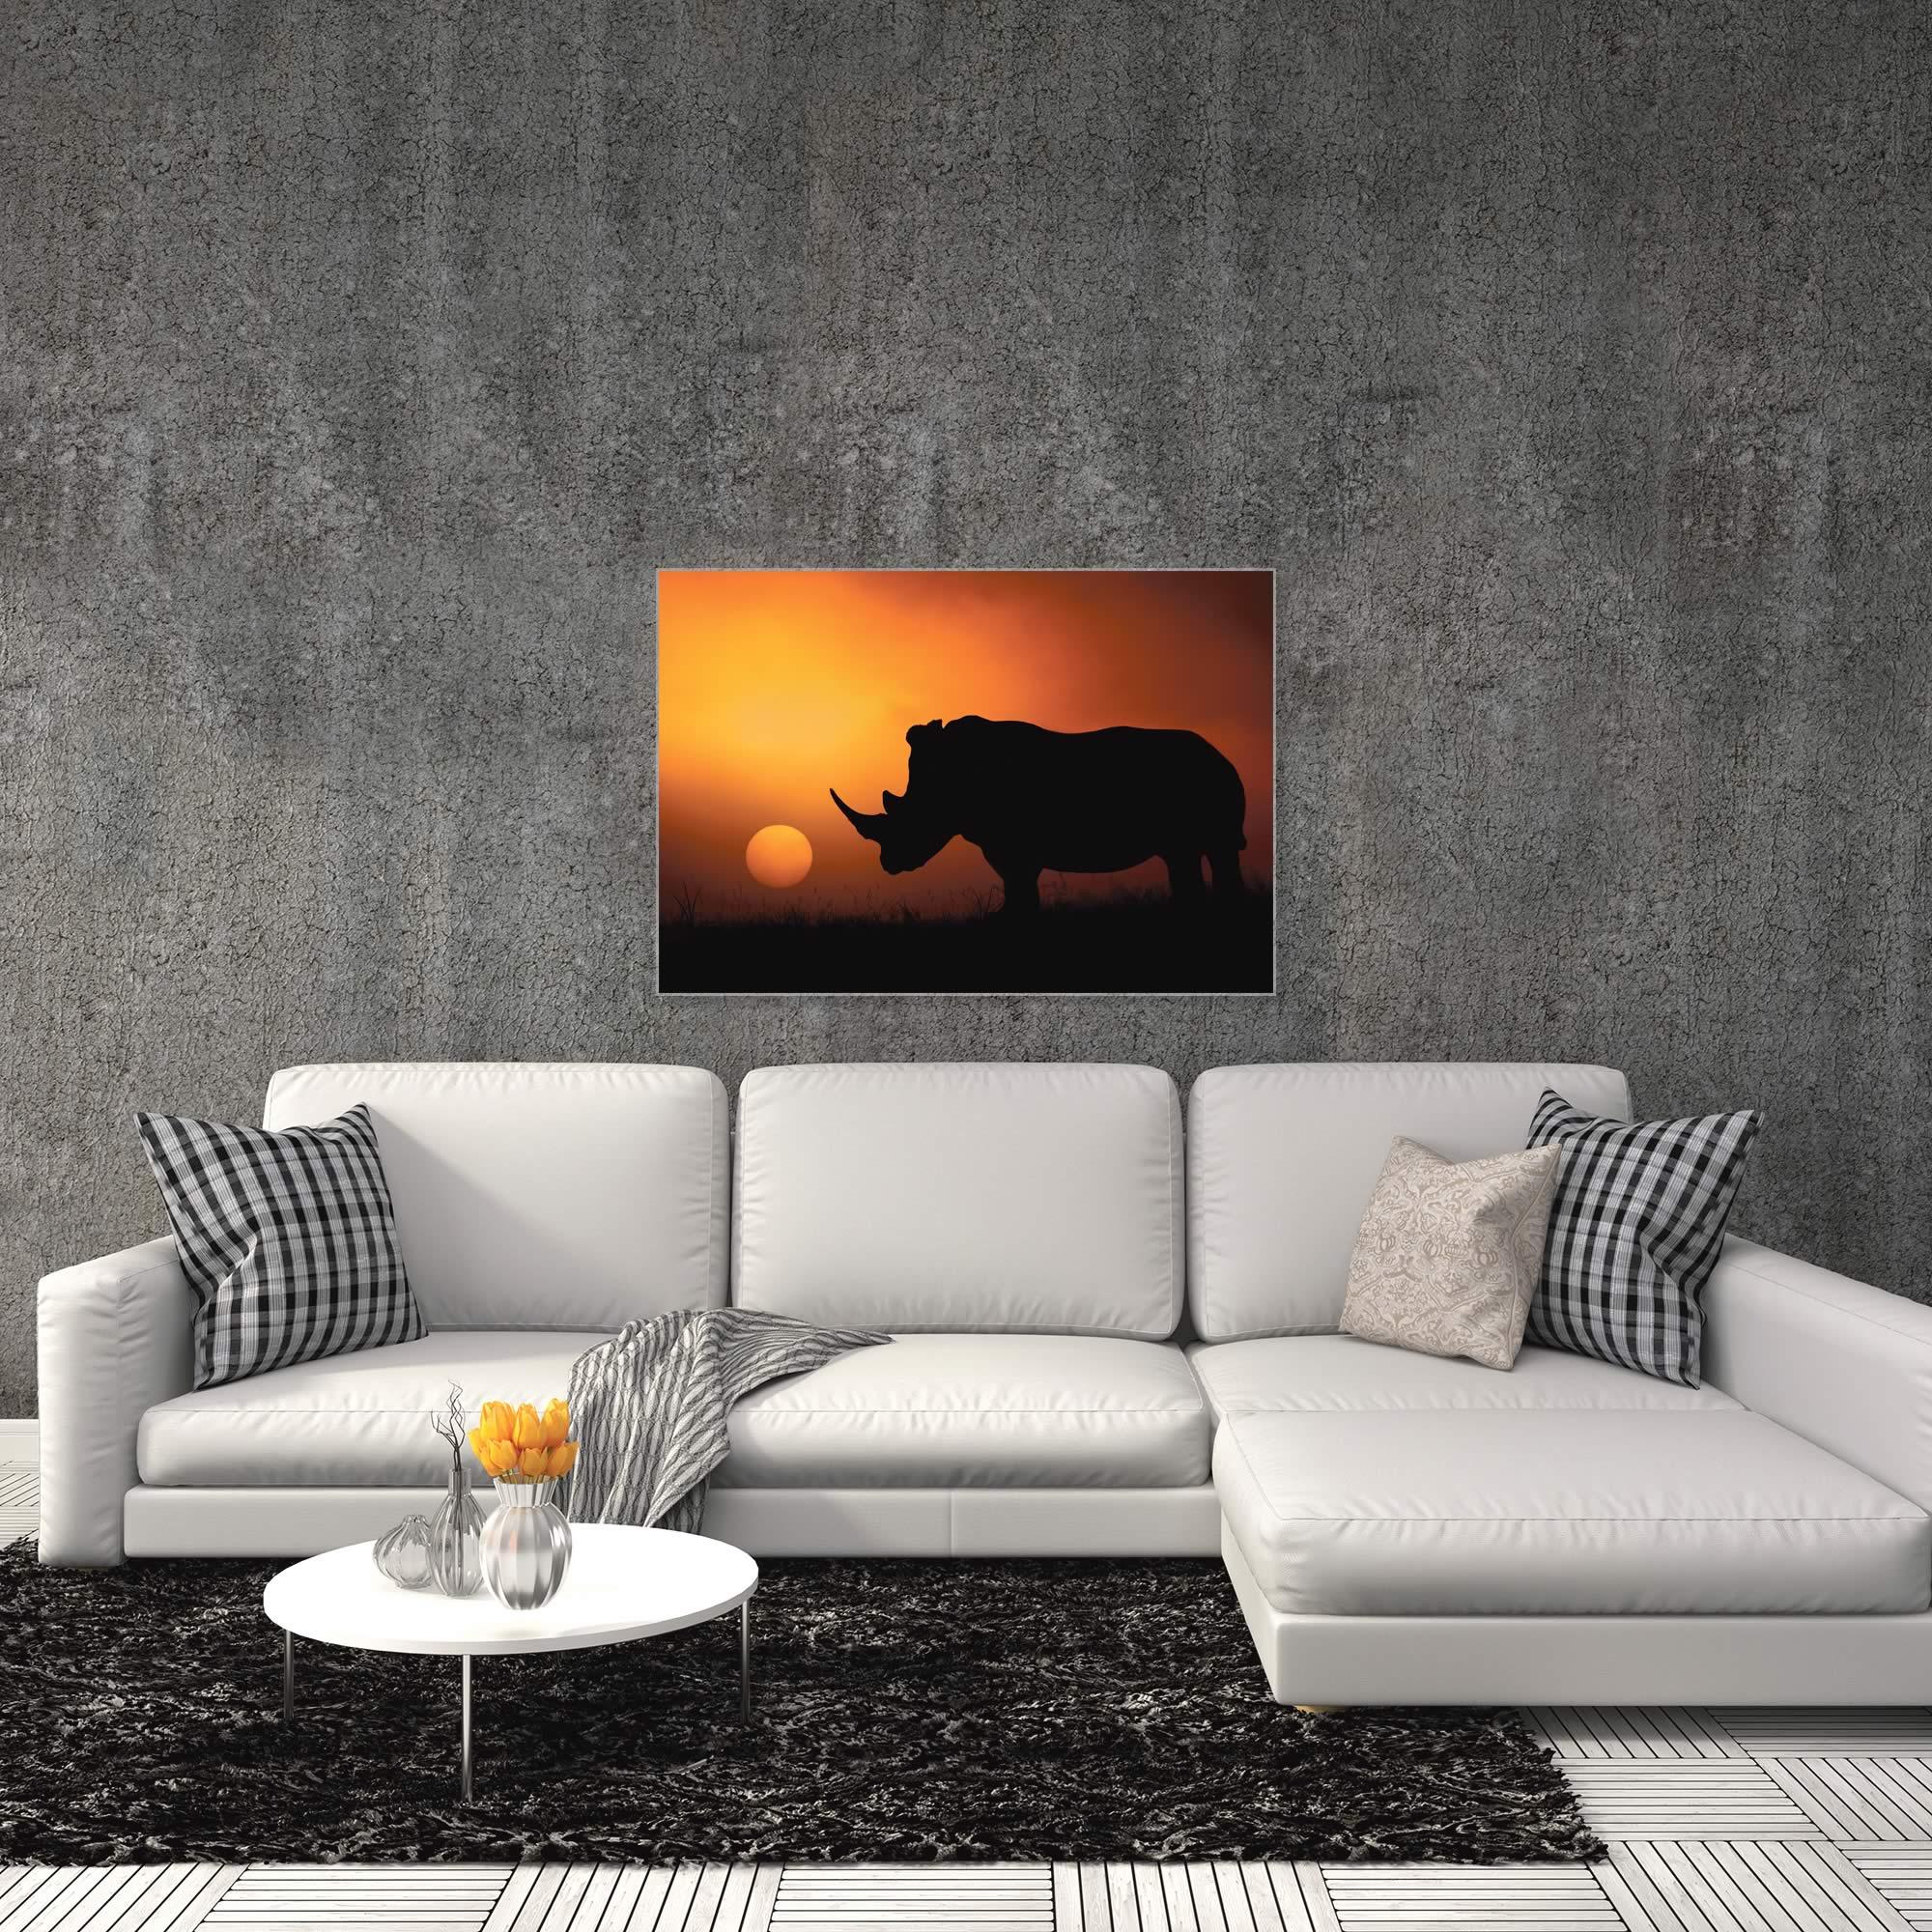 Rhino Sunrise by Mario Moreno - Rhino Silhouette Art on Metal or Acrylic - Alternate View 3